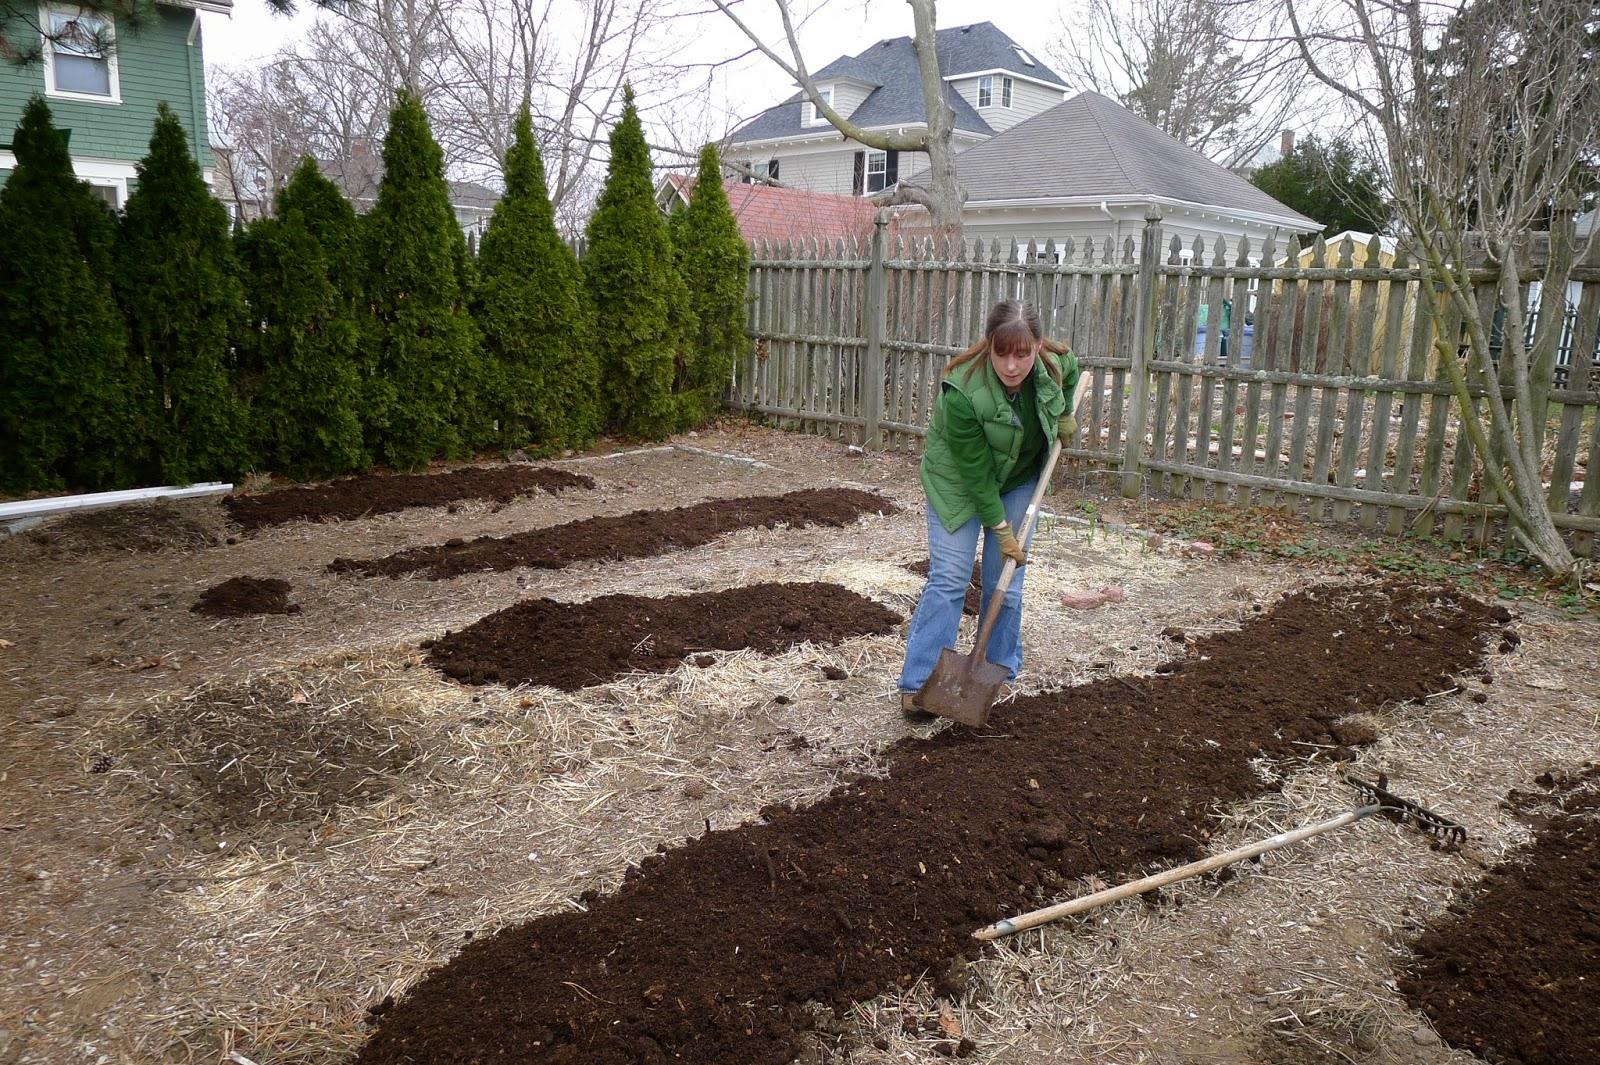 Using manure to fertilize vegetable beds